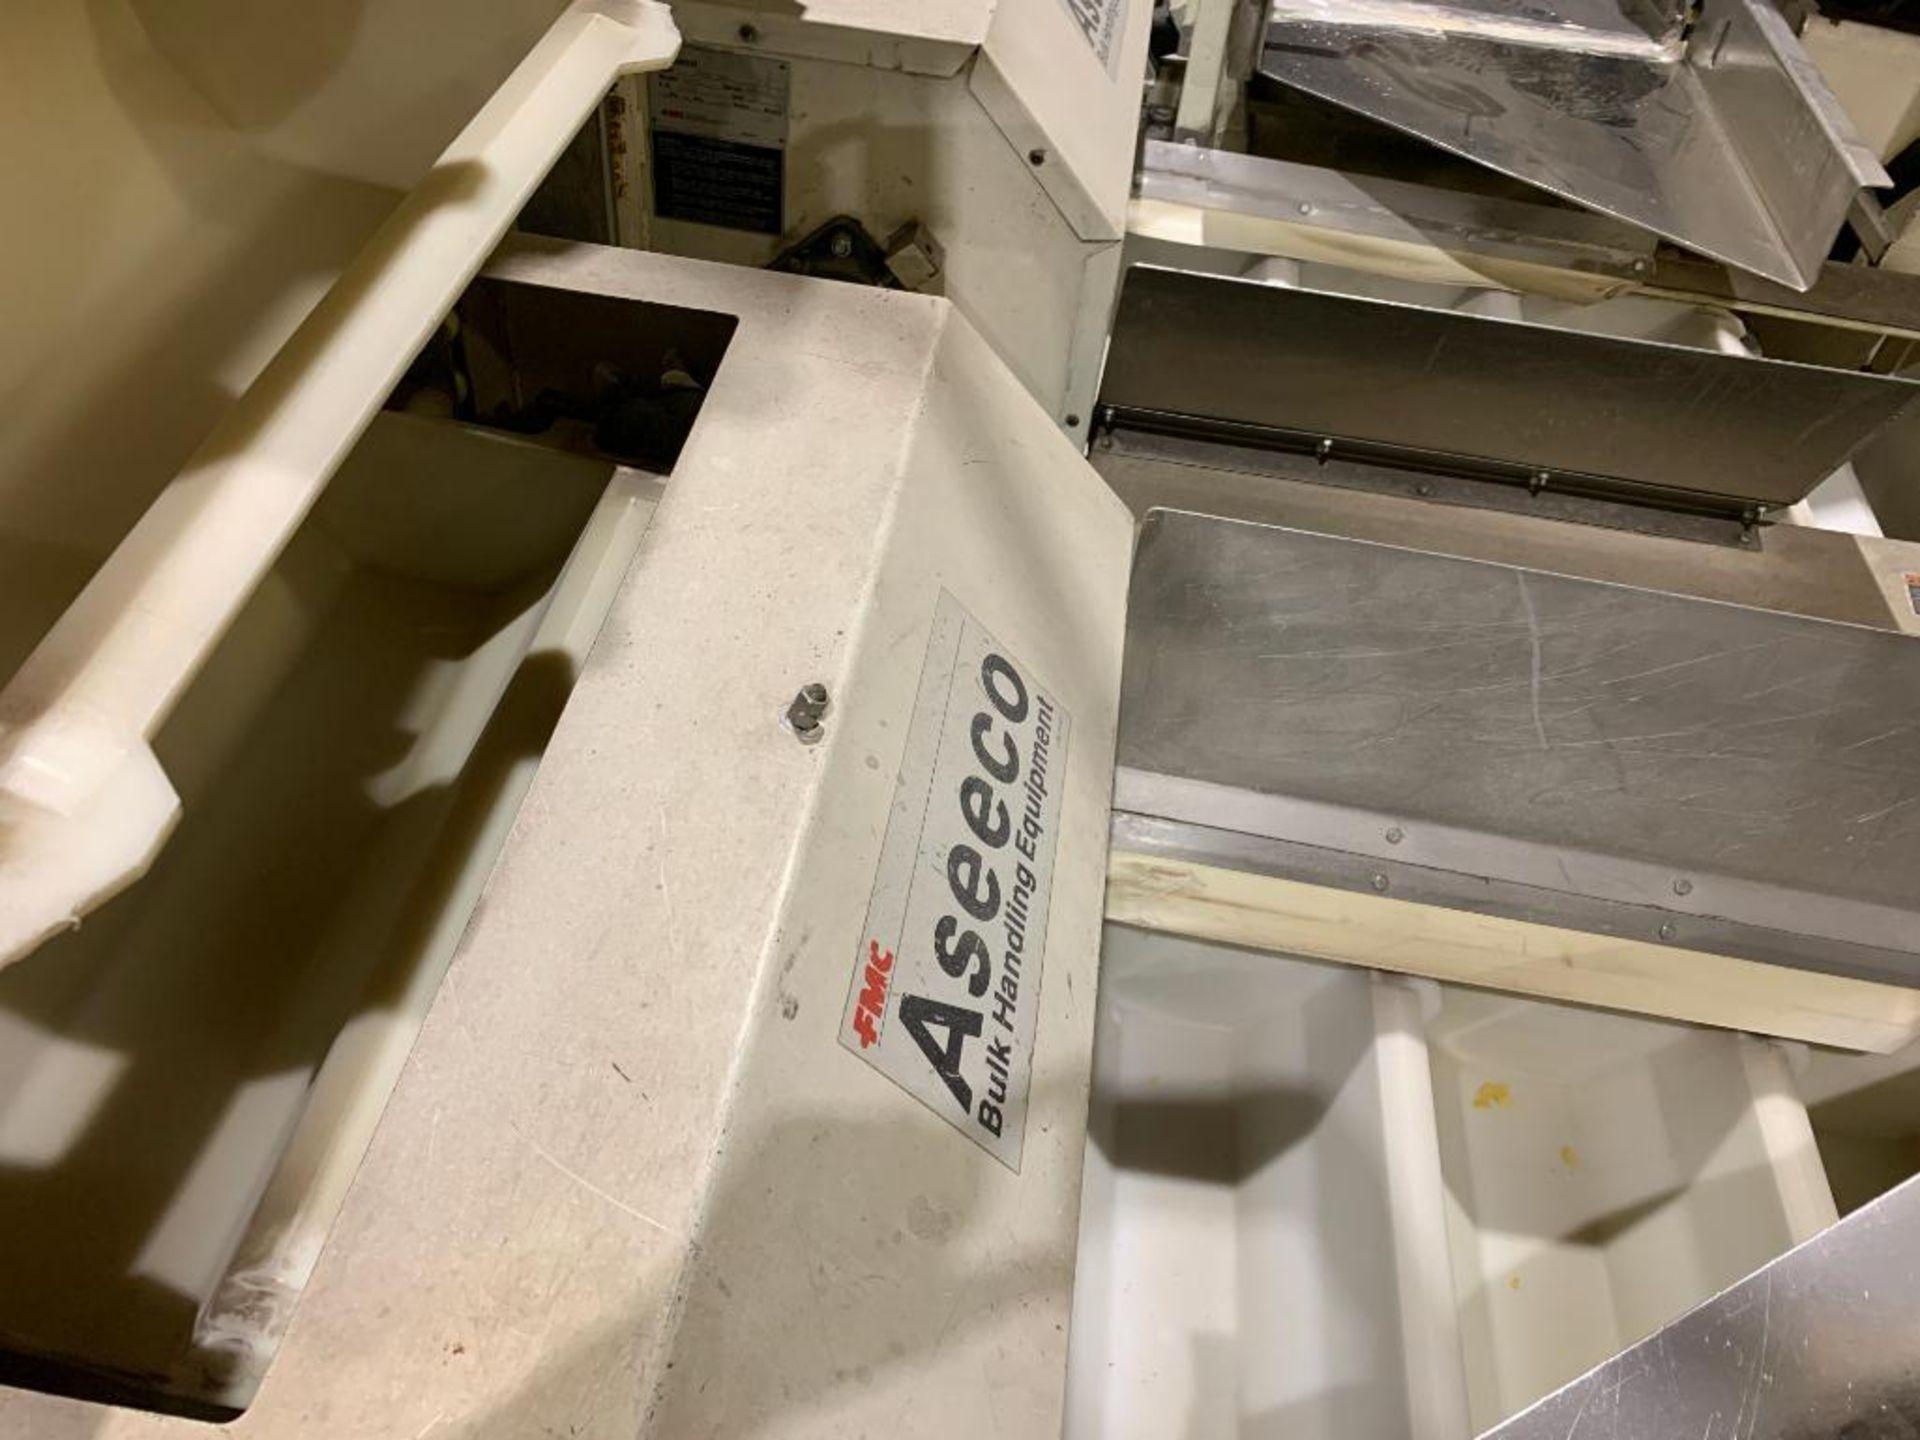 1990 Aseeco horizontal bucket elevator, model ALH-0-24 - Image 2 of 12